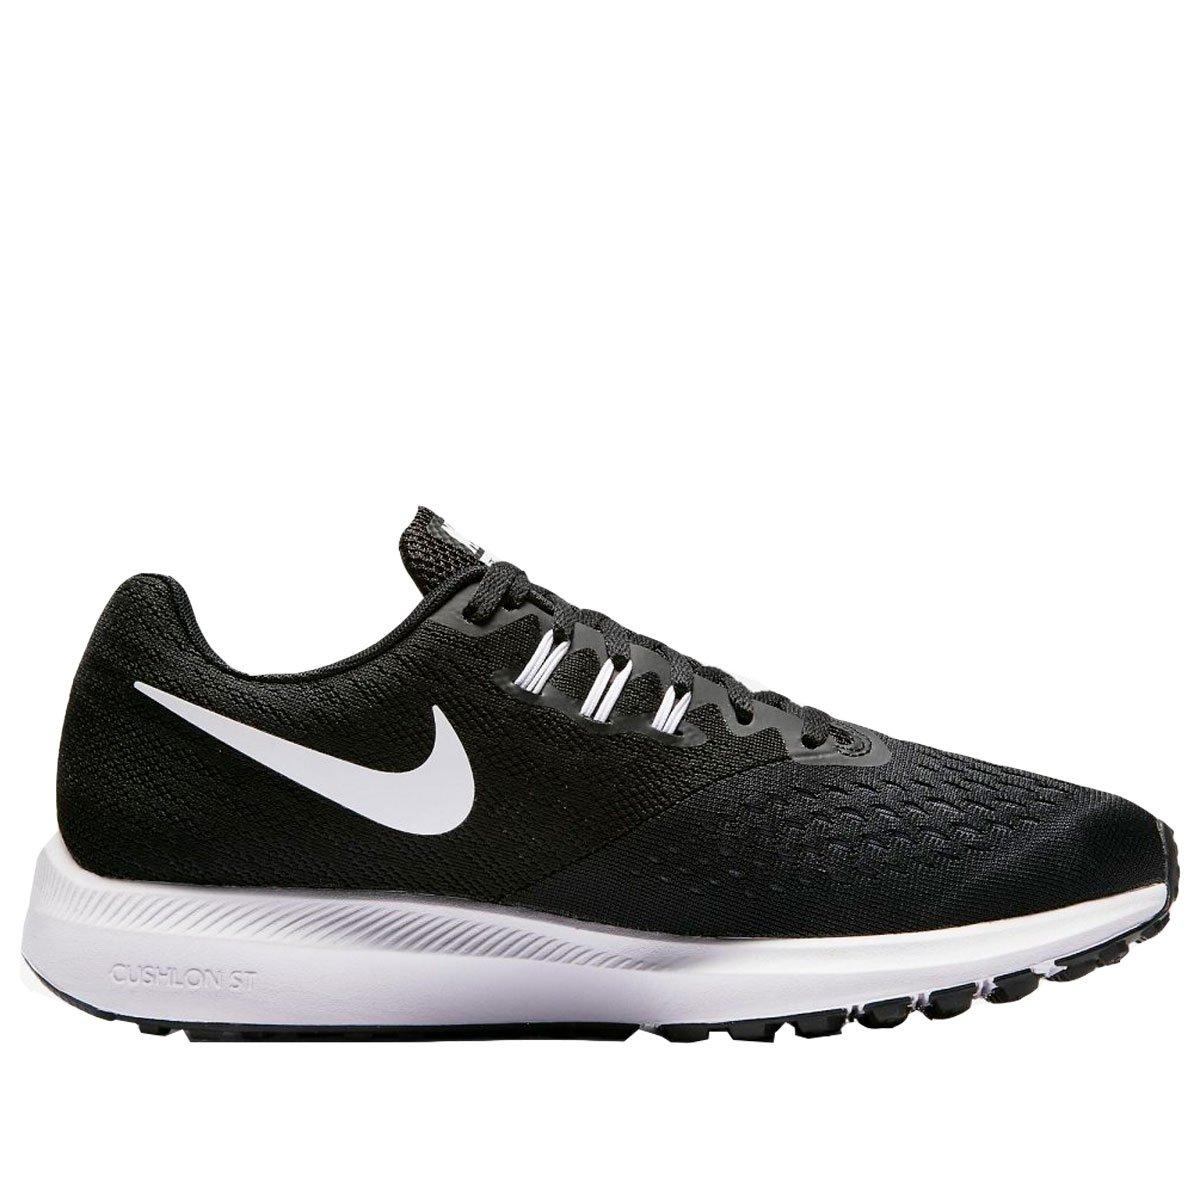 b114fa580c Bizz Store - Tênis Feminino Nike Zoom Winflo 4 Corrida Preto